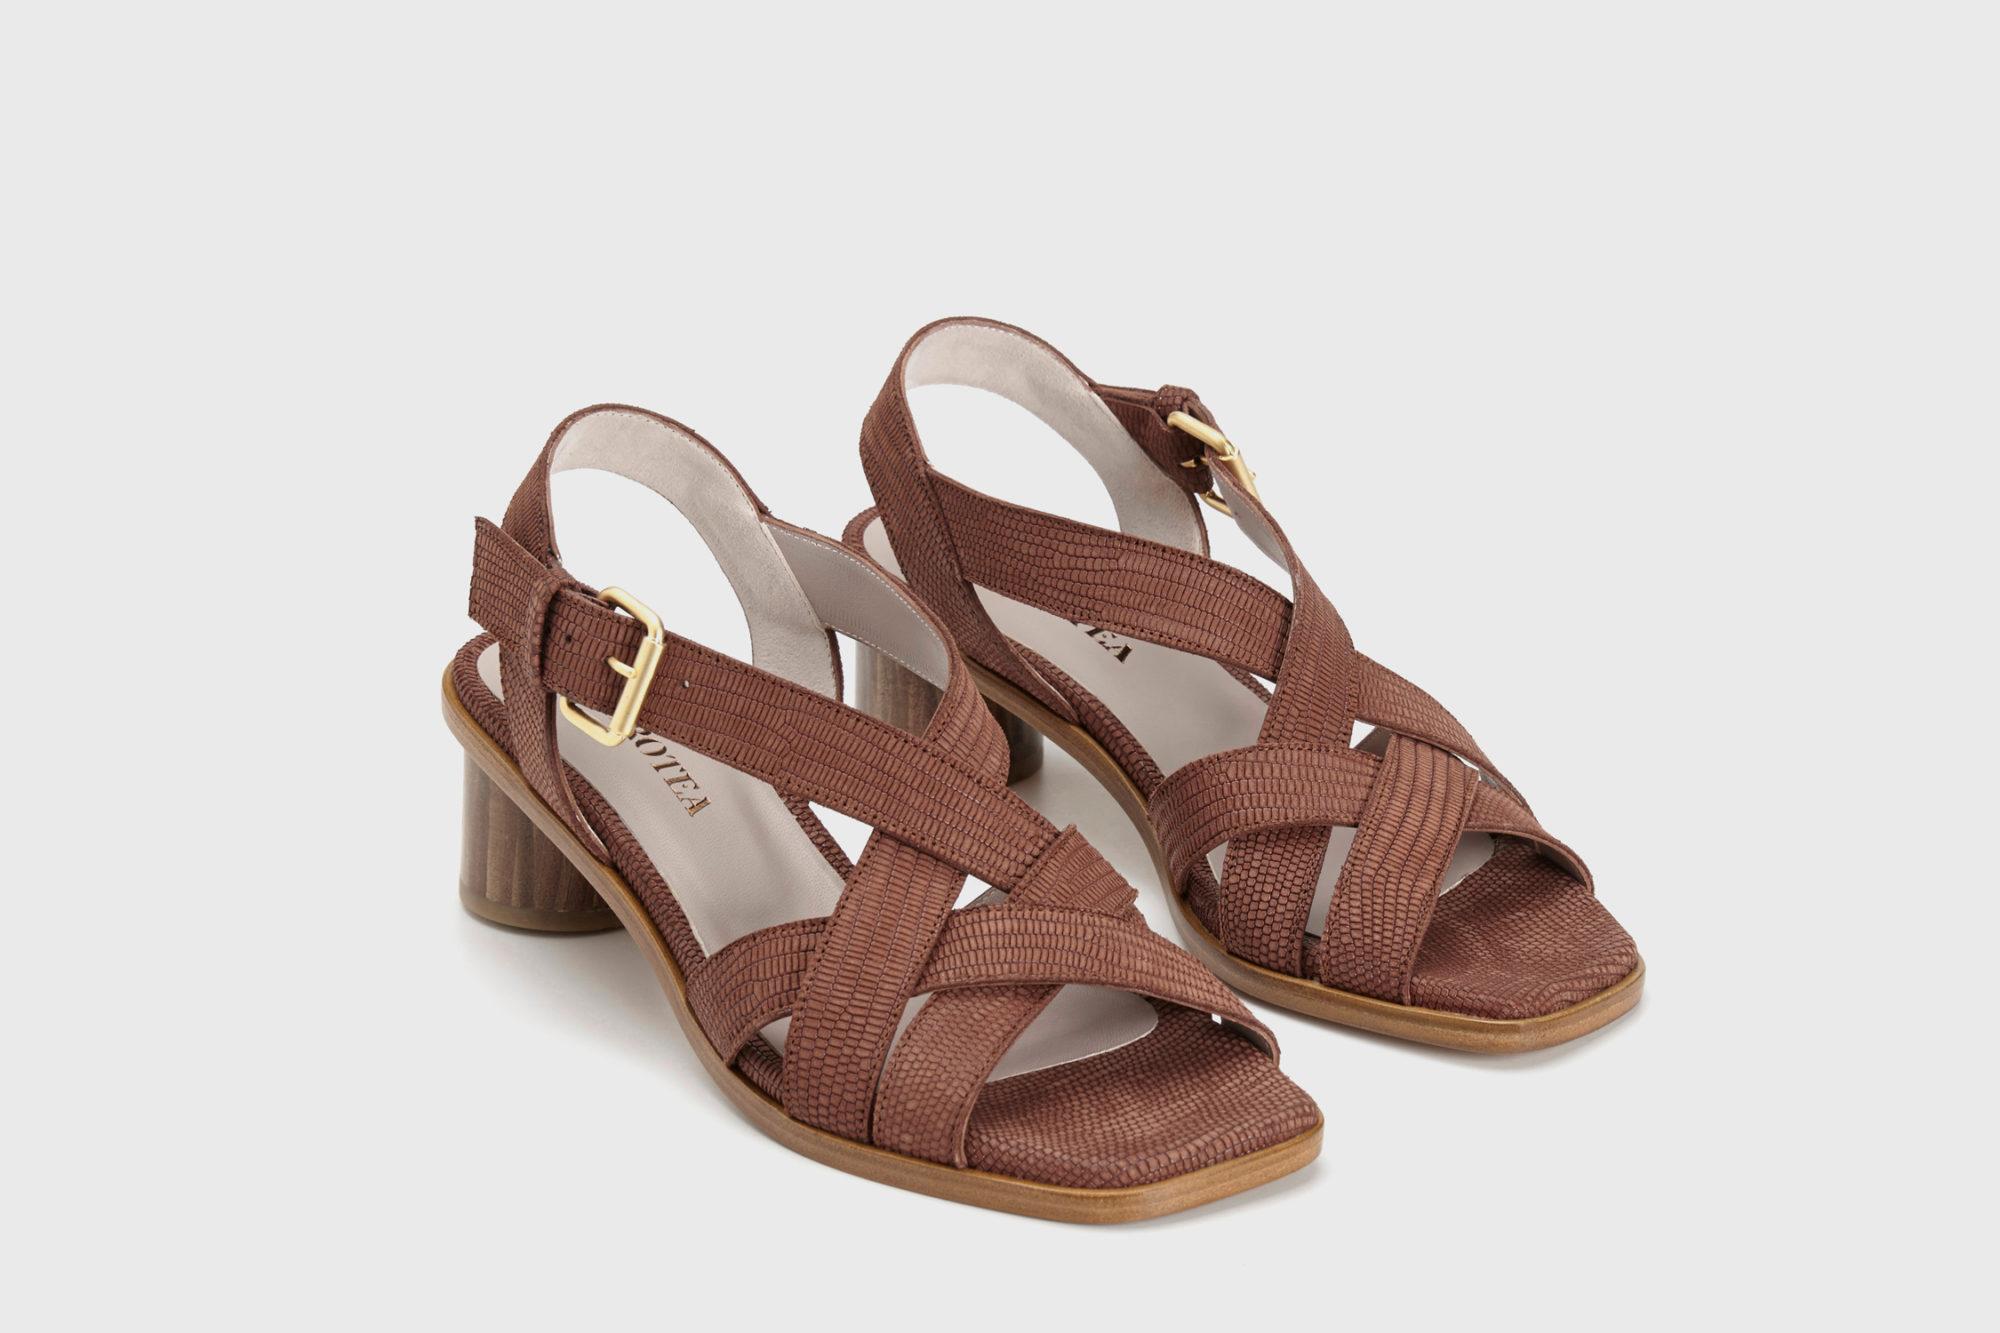 Dorotea sandalia de tacón medio Jeanne marrón ss17 par